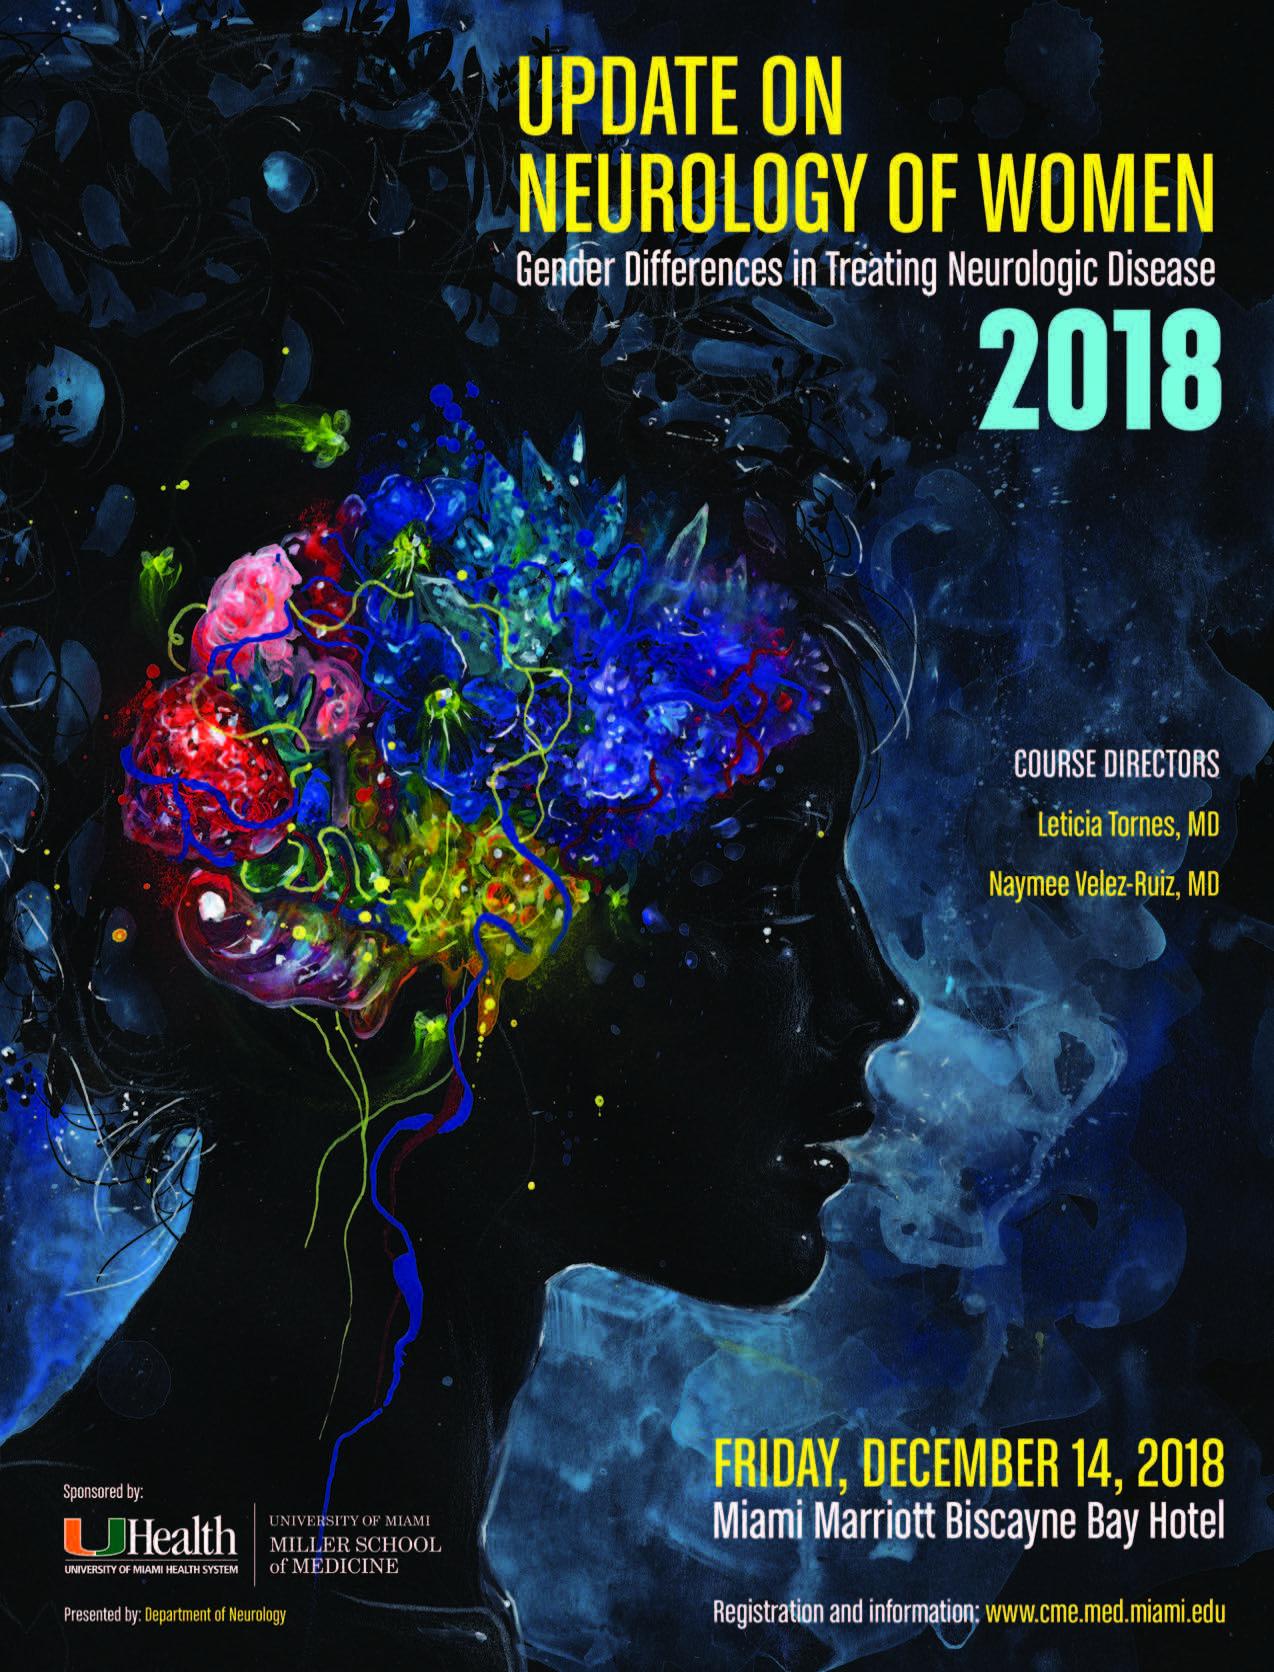 Update on Neuro for Women Brochure Cover